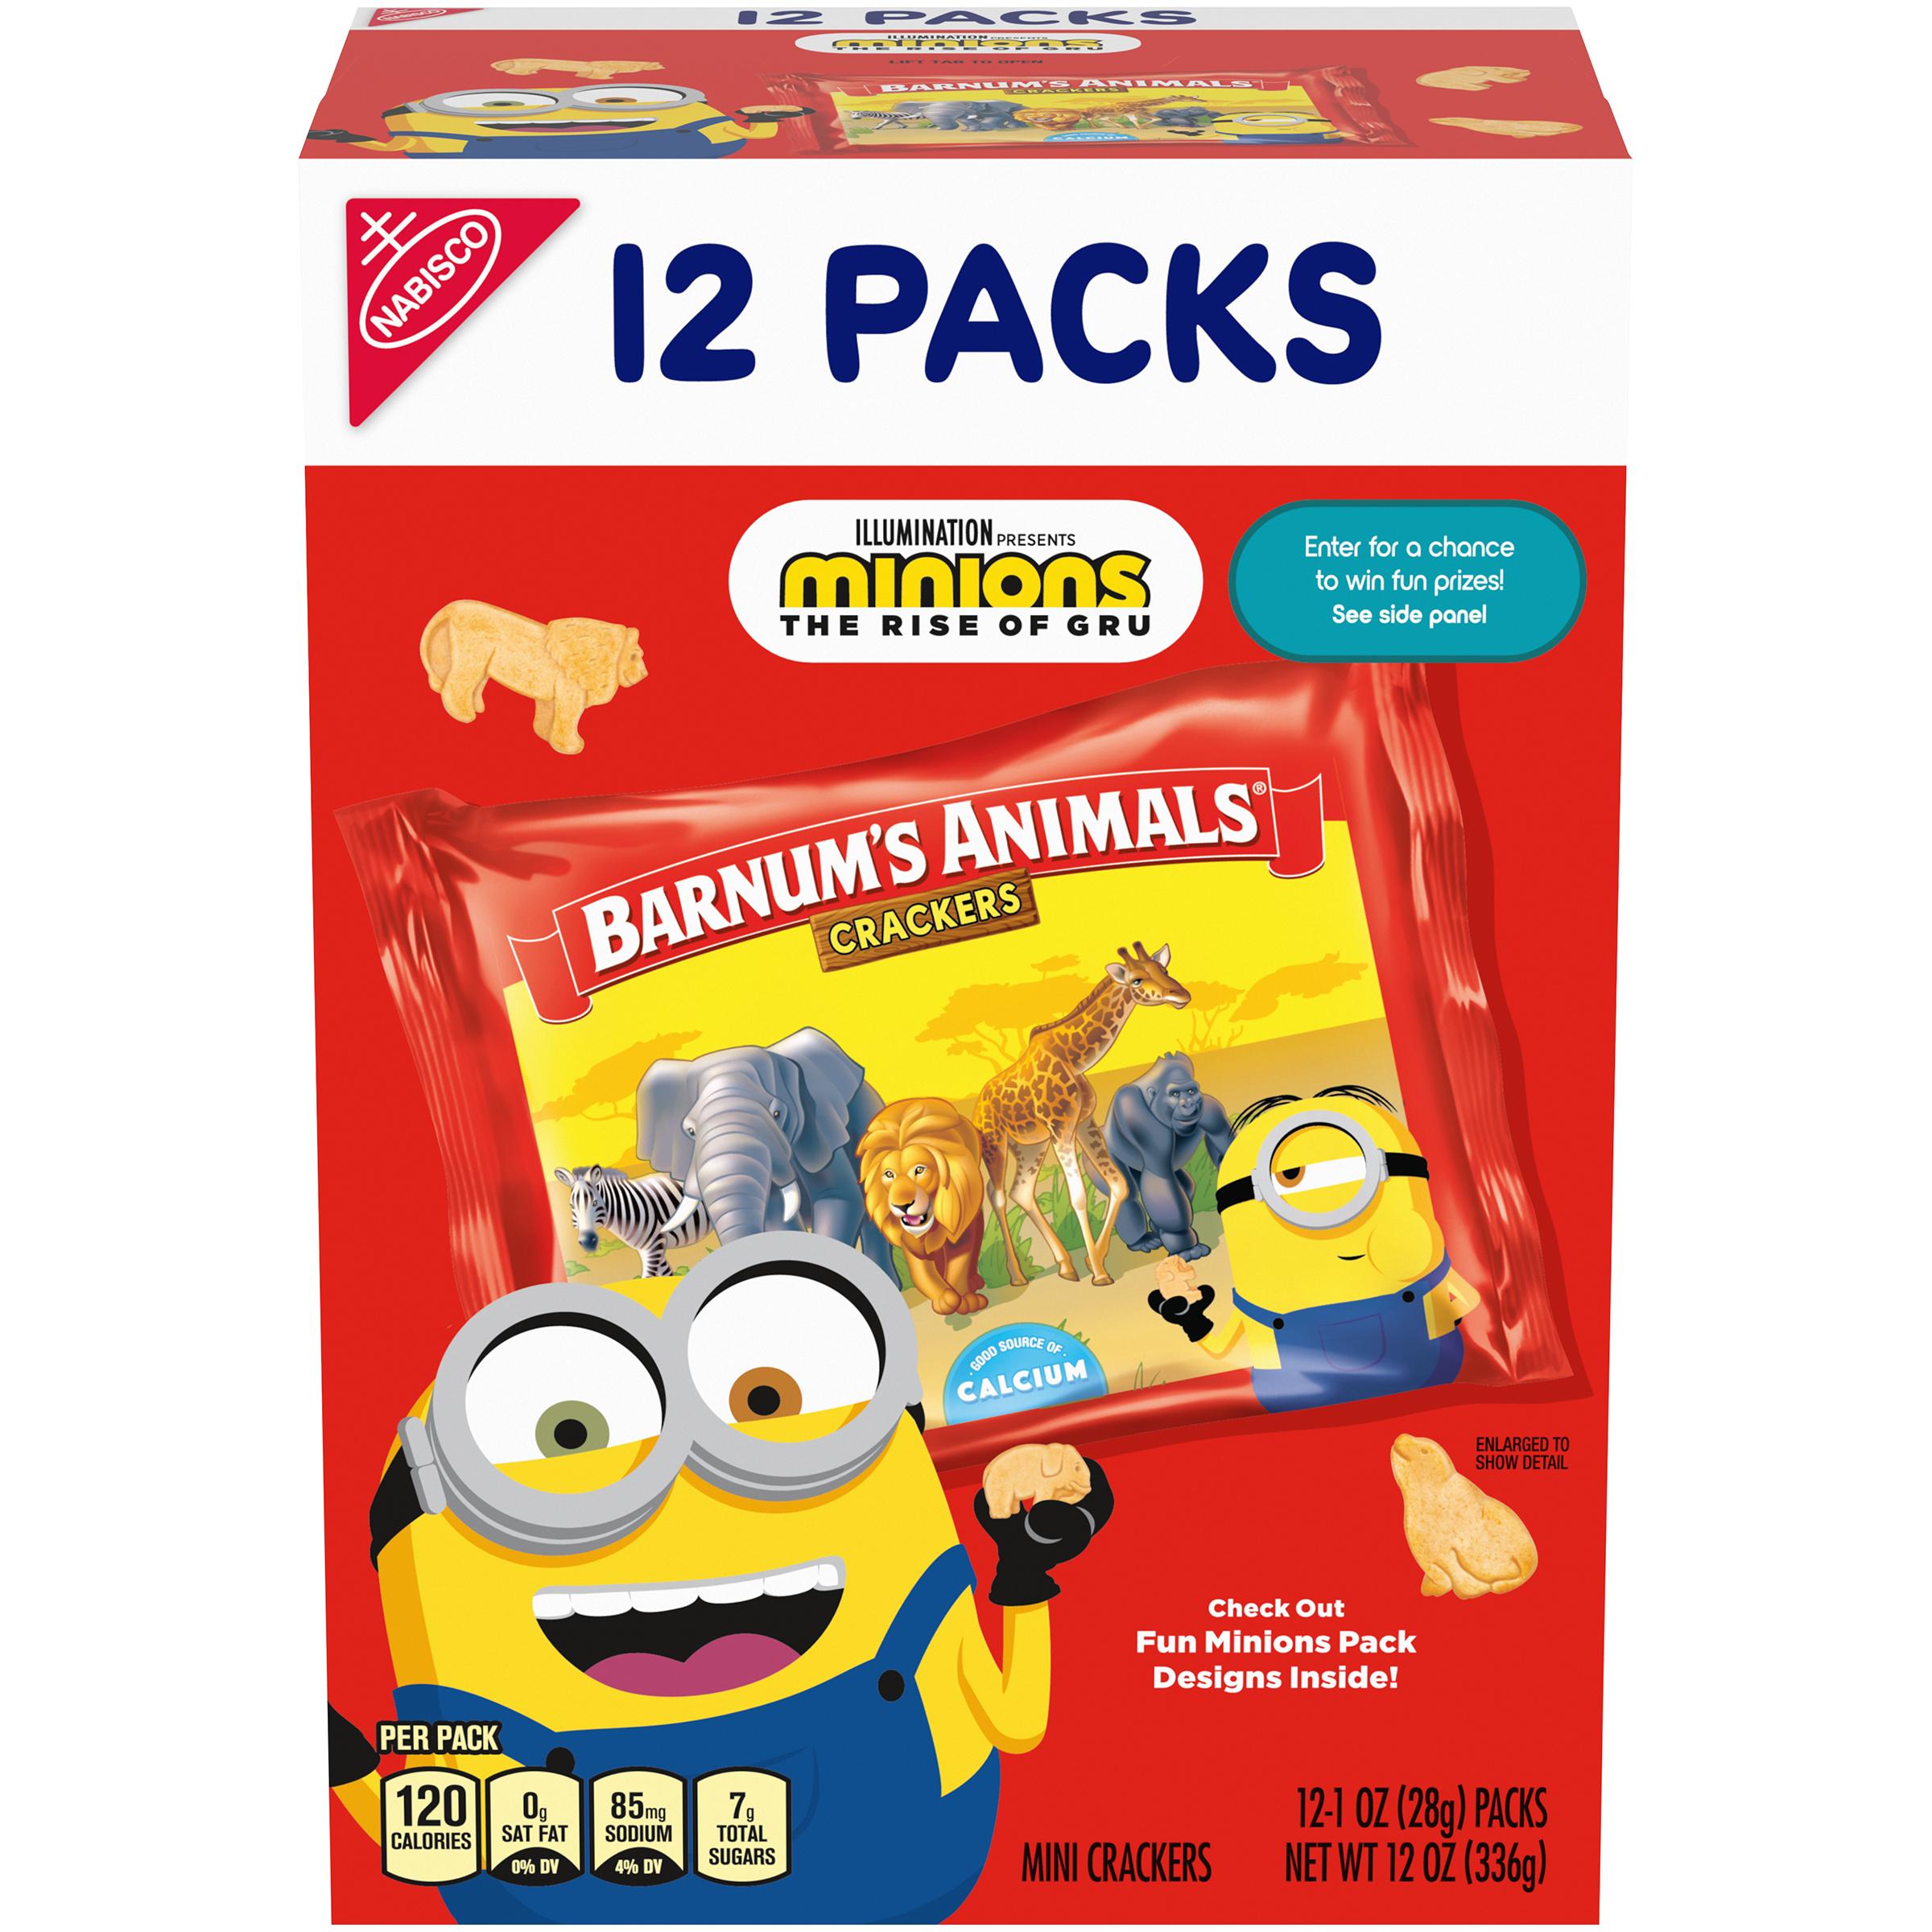 BARNUMS Multipack Crackers 12 oz